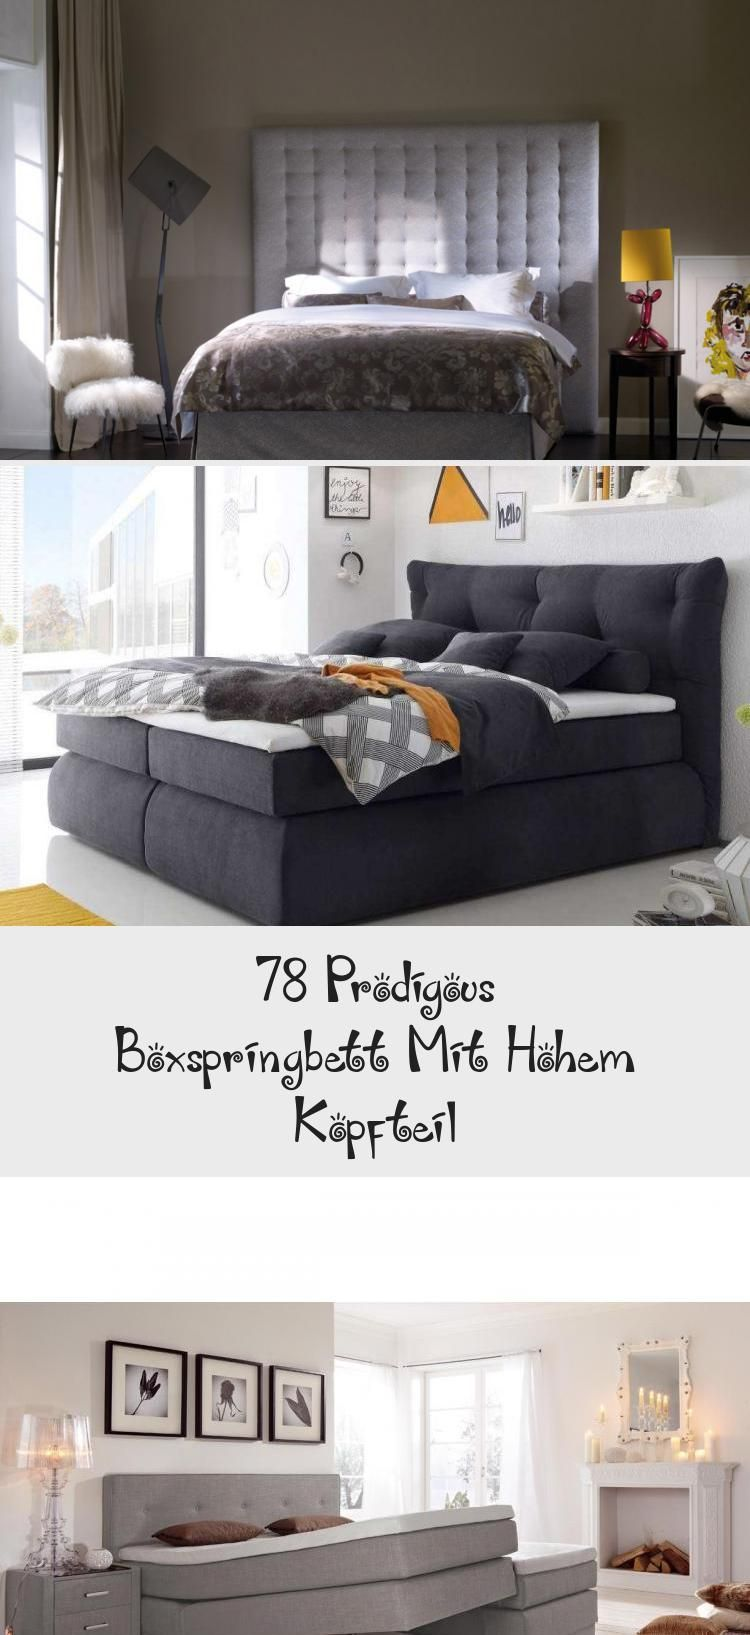 78 Prodigous Boxspringbett Mit Hohem Kopfteil Boxspringbett Bett Moderne Schlafzimmermobel